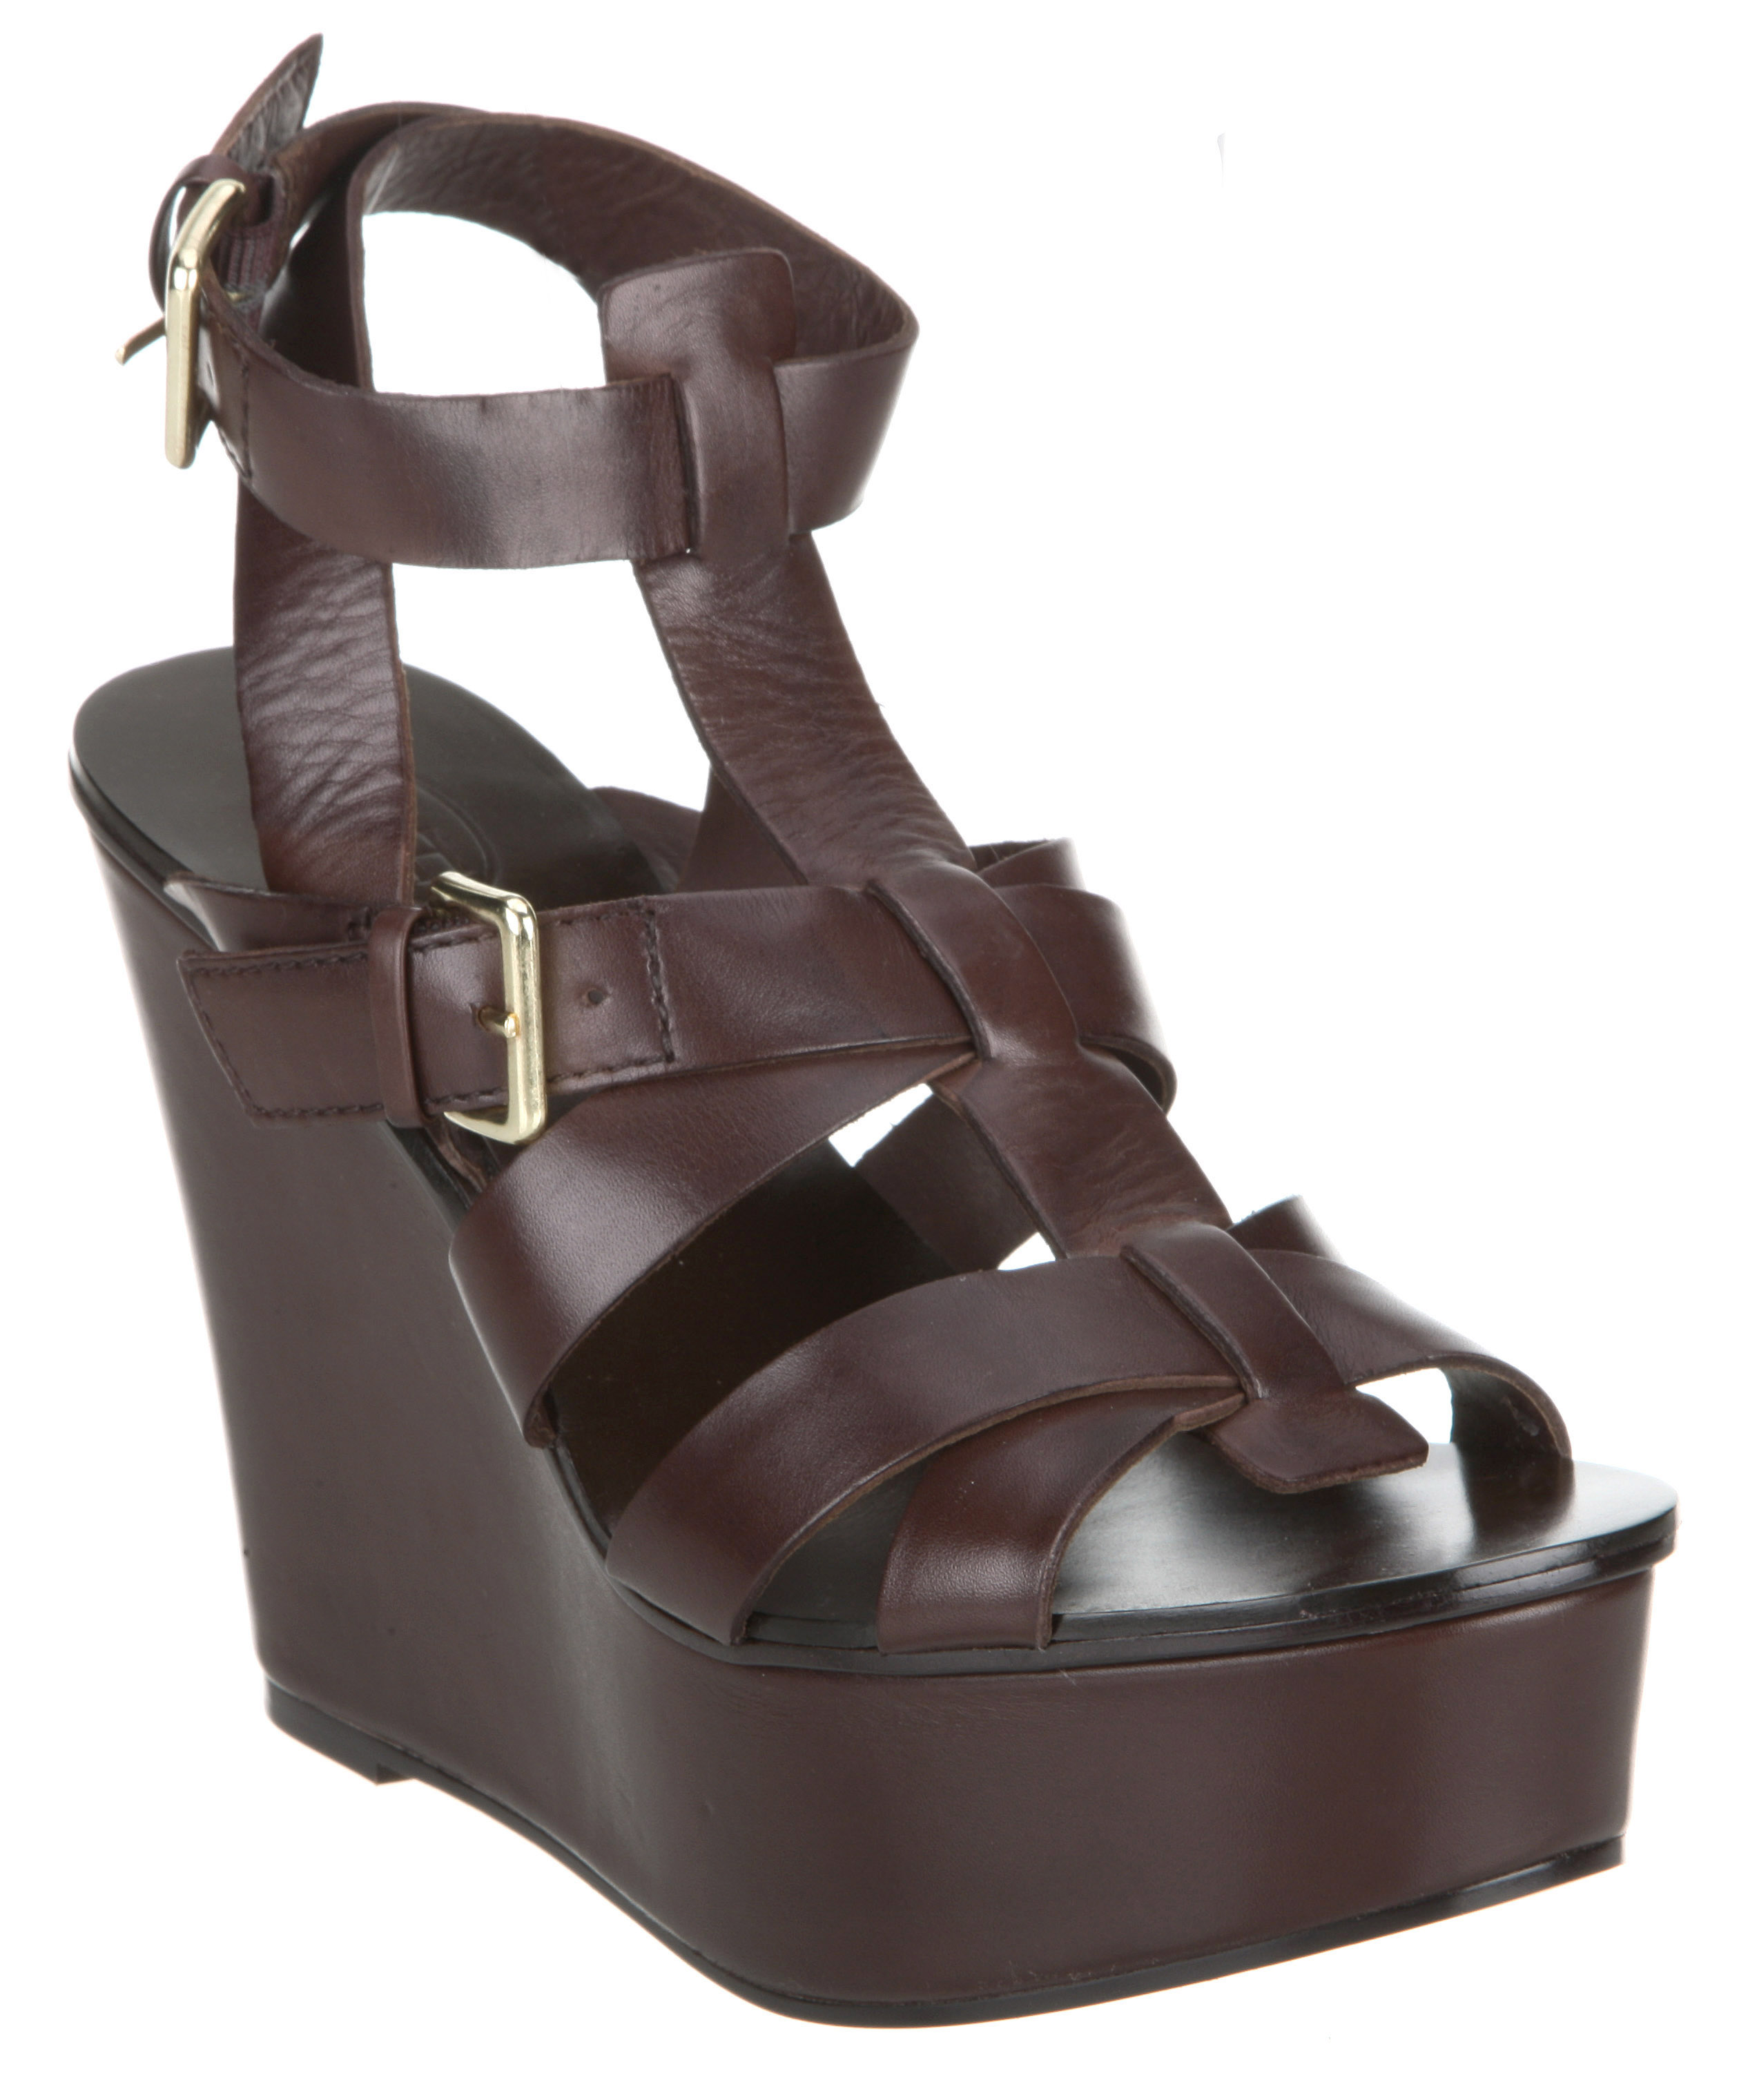 Womens-Ash-Banyan-Wedge-Gladiator-Choc-Brown-Leather-Heels